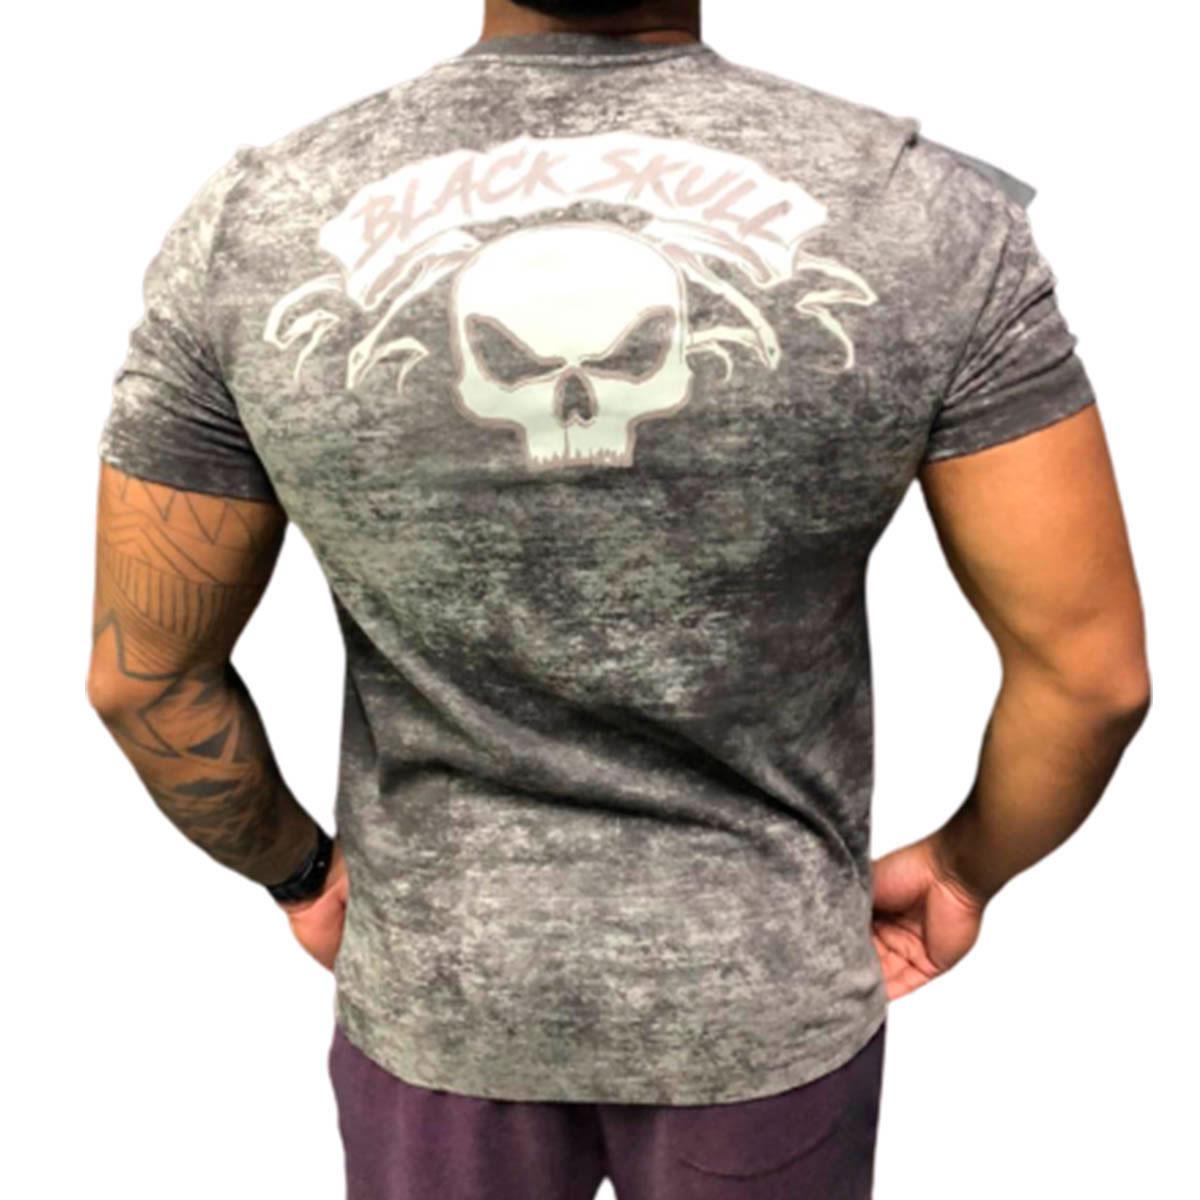 T-shirt Cacique Skull Mescla - Black Skull Clothing